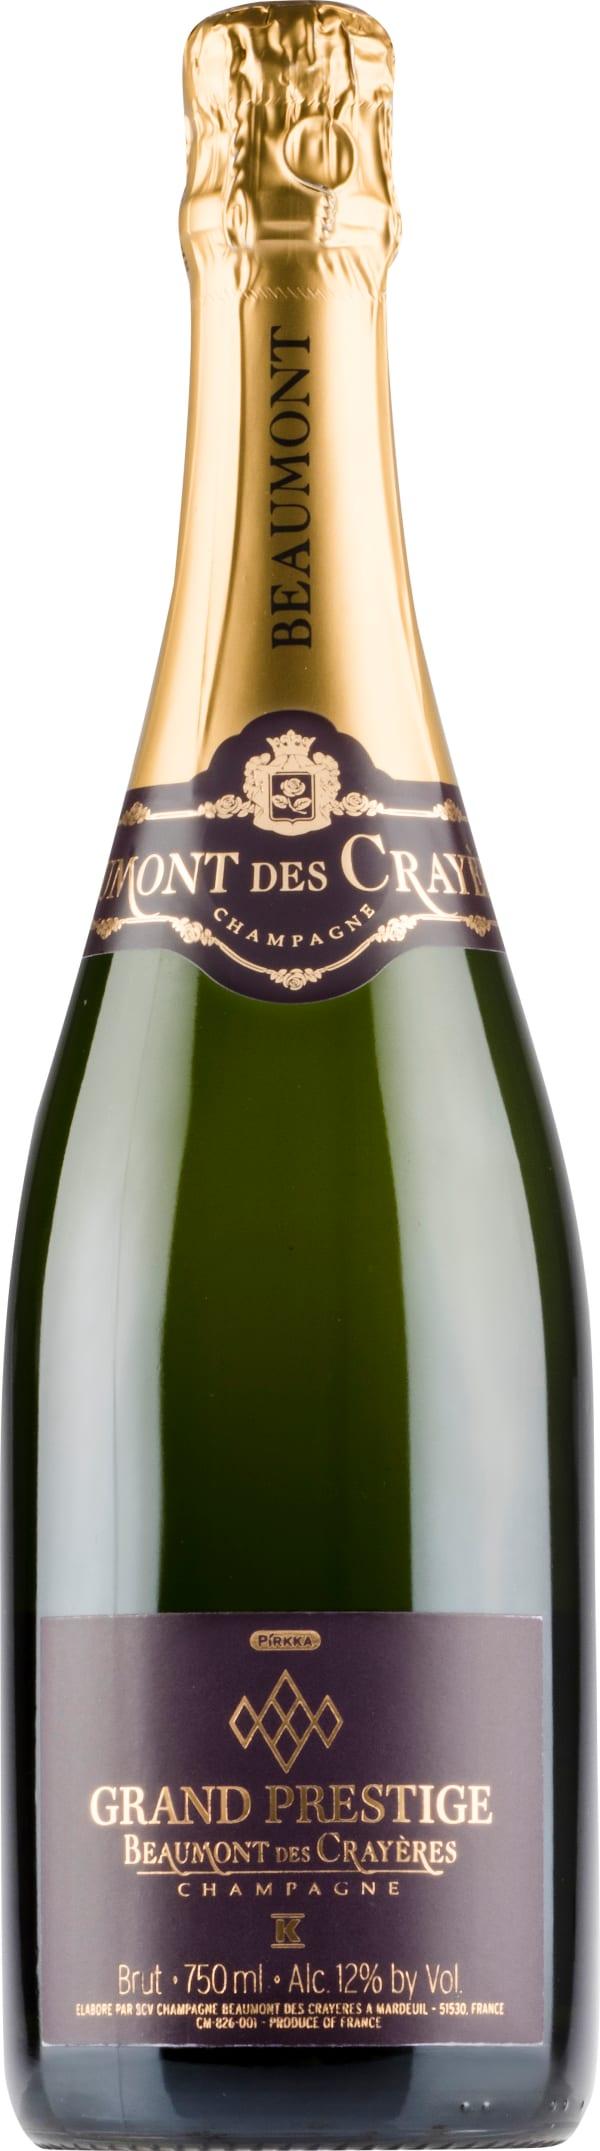 Pirkka Grand Prestige Champagne Brut